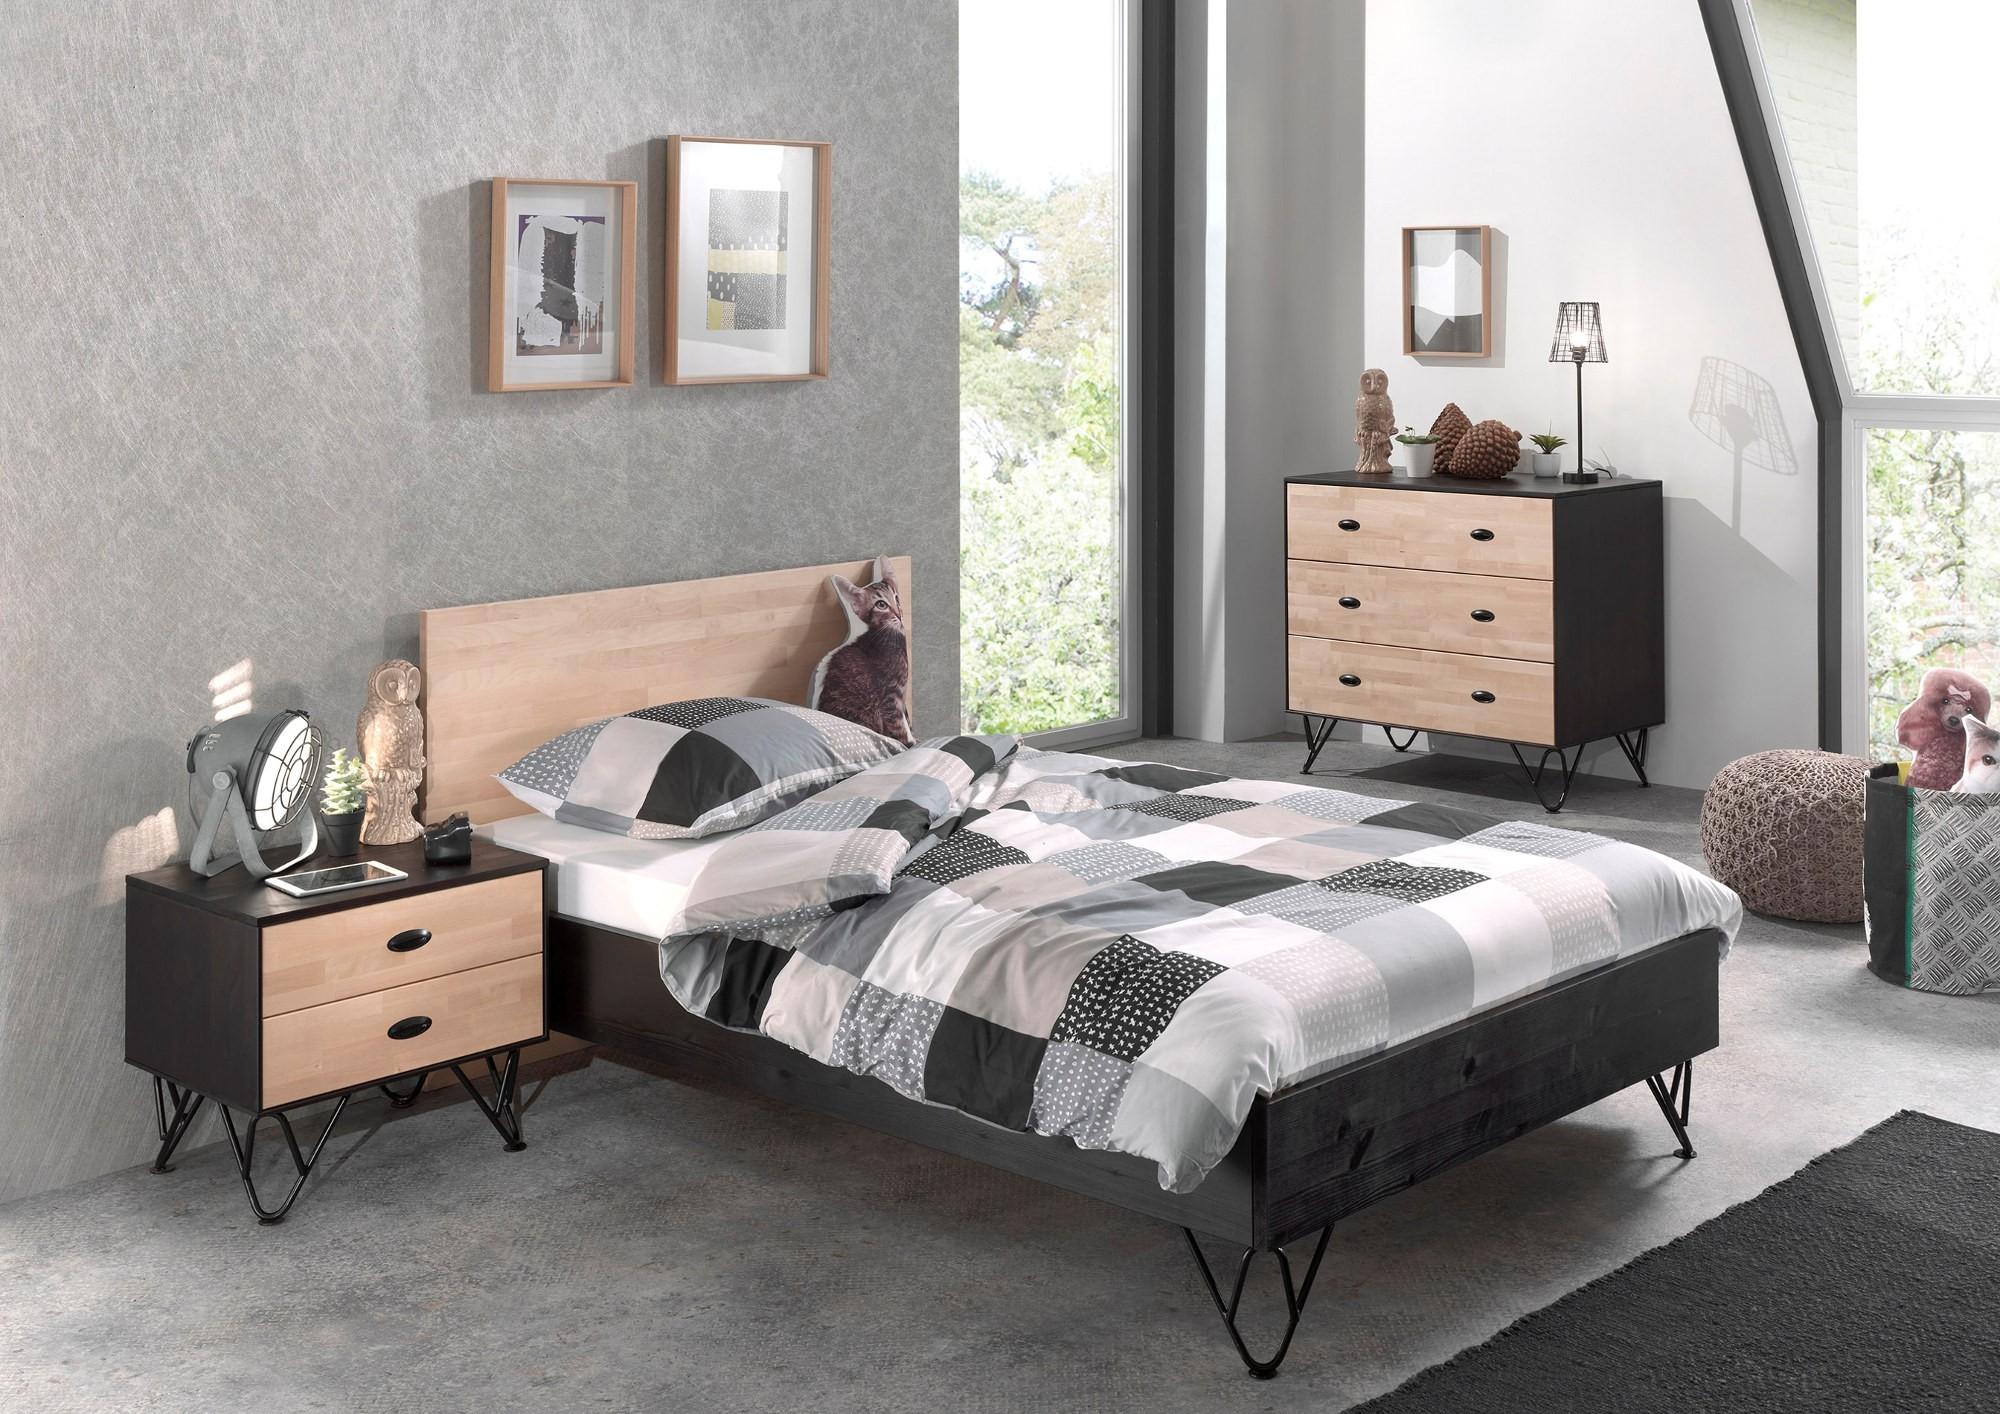 kommode william 3 schubladen birke natur schwarz kinder jugendzimmer beistellm bel. Black Bedroom Furniture Sets. Home Design Ideas